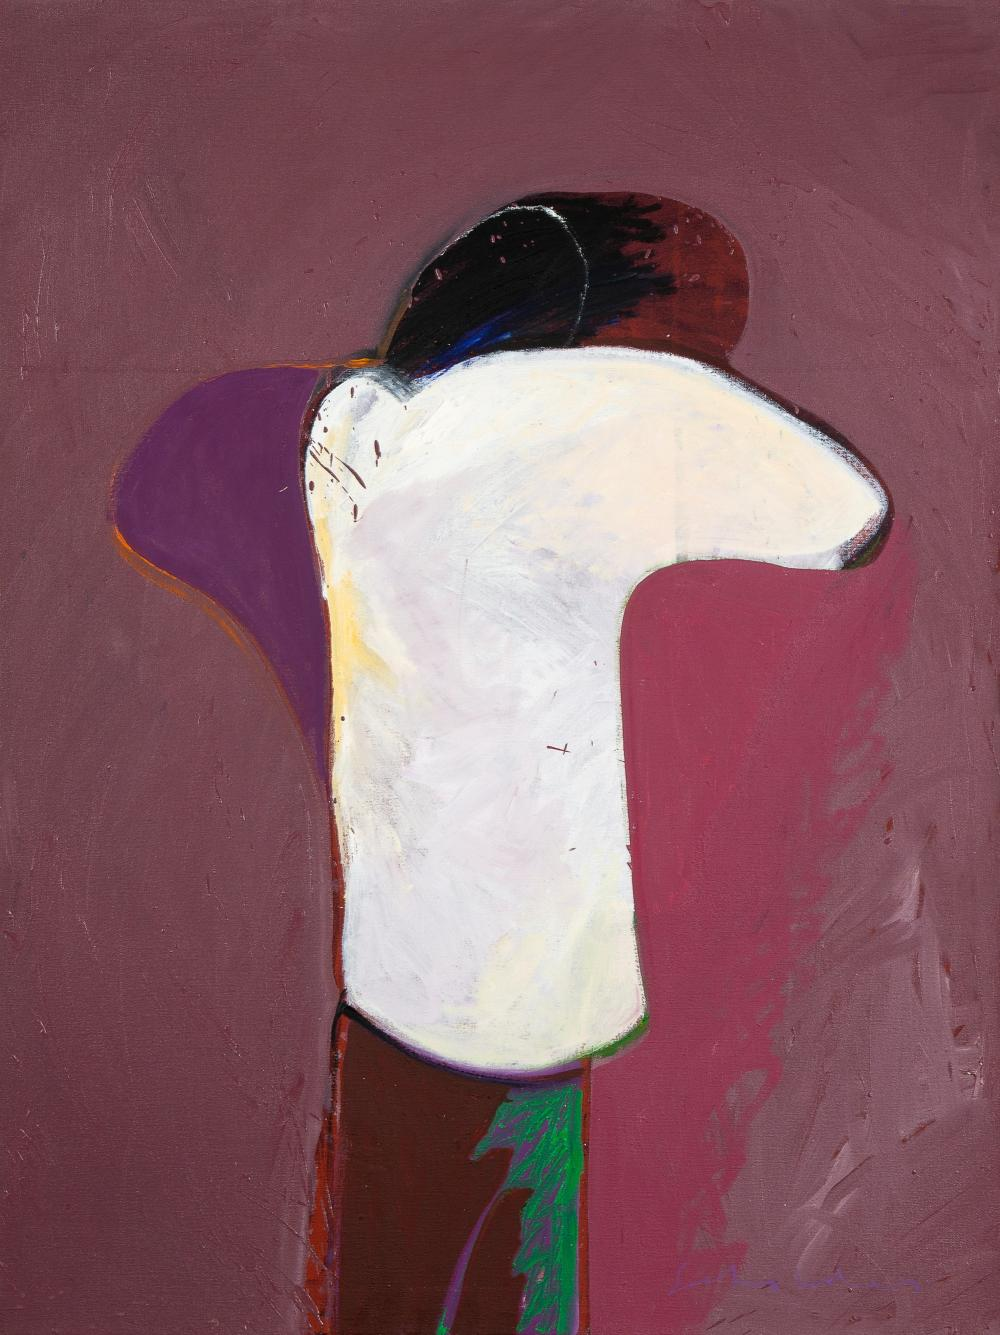 Fritz Scholder, American Portrait #52, 1982